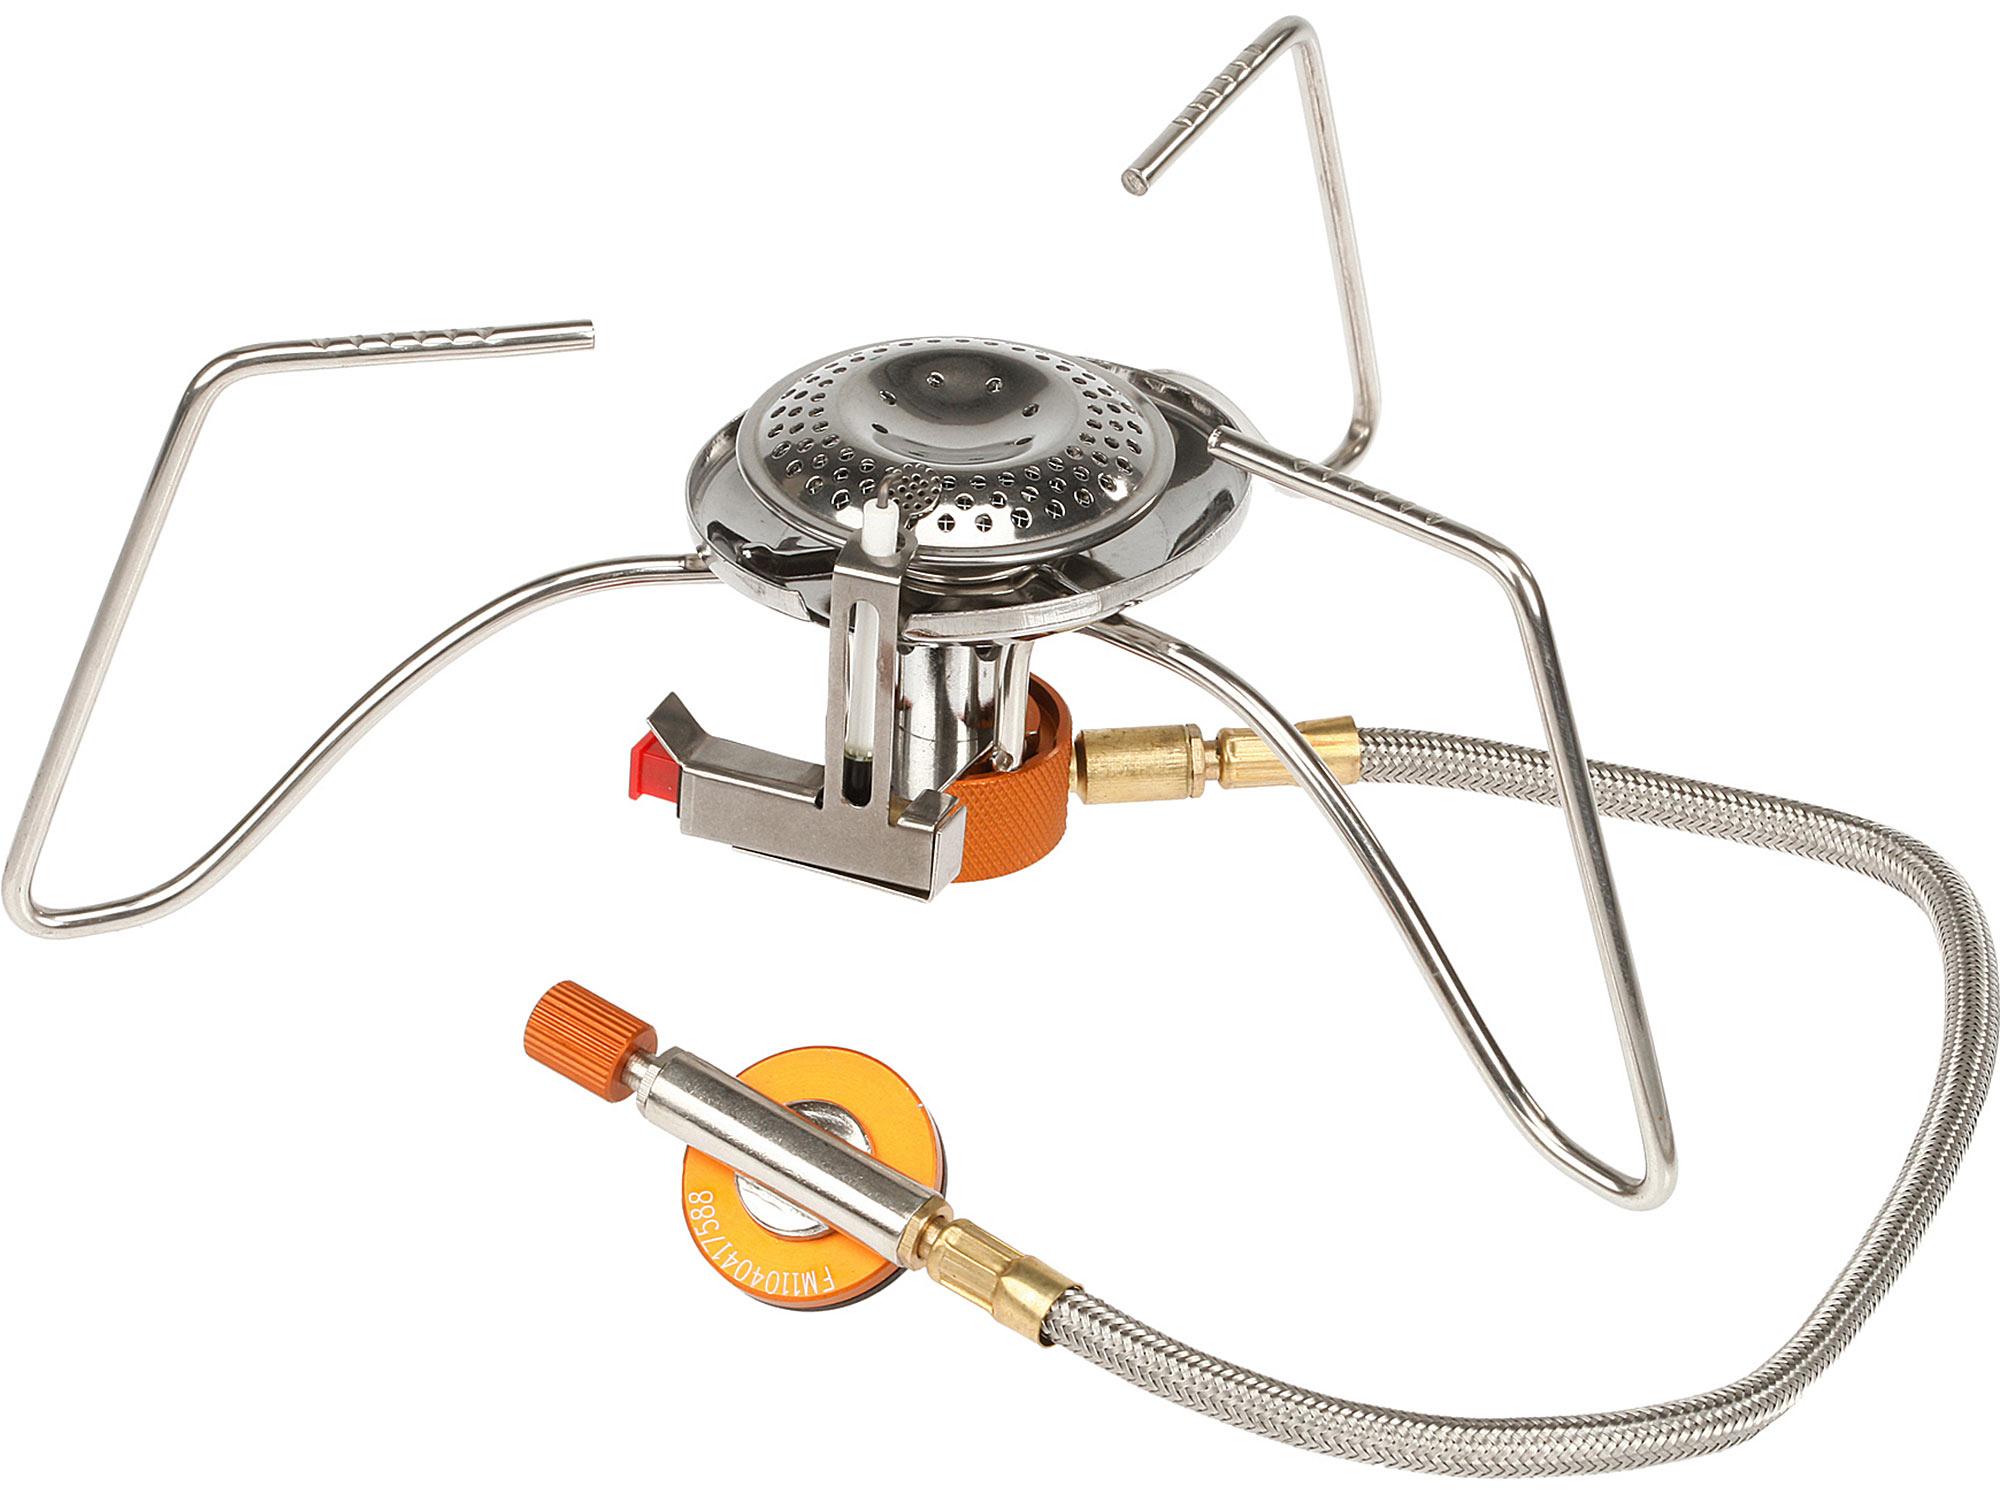 Fire-Maple Газовая горелка Fire-Maple газовая горелка turbojet zah 65c